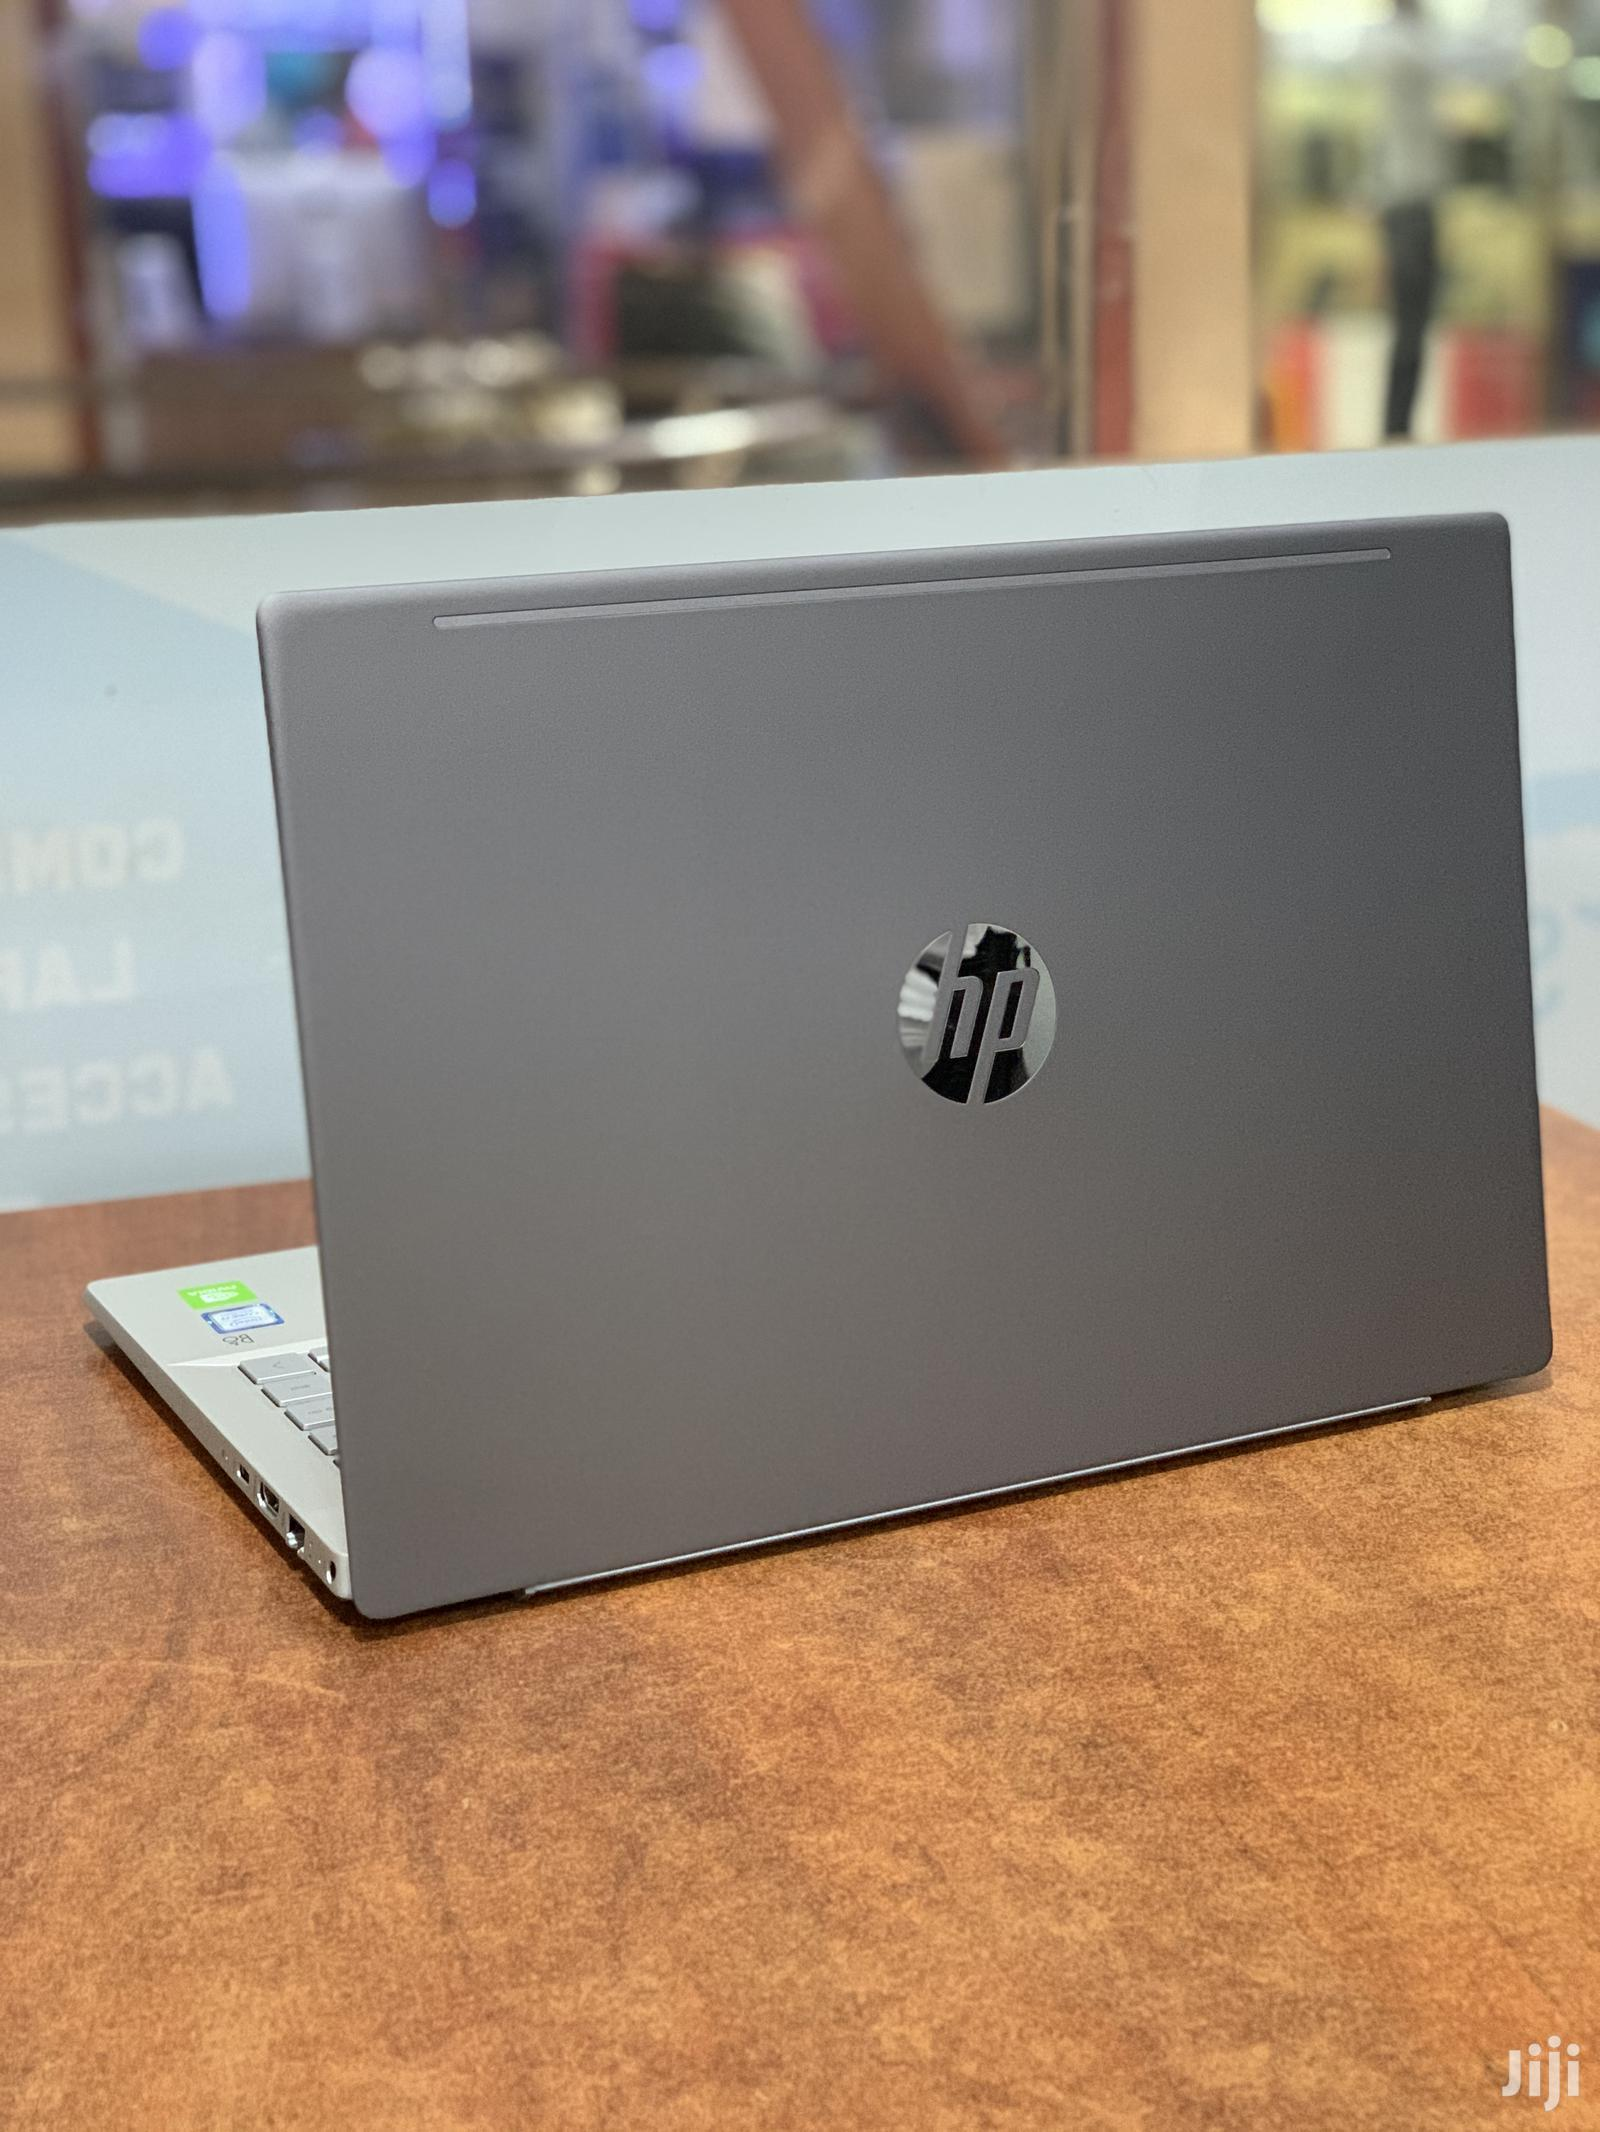 New Laptop HP Pavilion 14 8GB Intel Core I7 SSHD (Hybrid) 512GB   Laptops & Computers for sale in Kampala, Central Region, Uganda